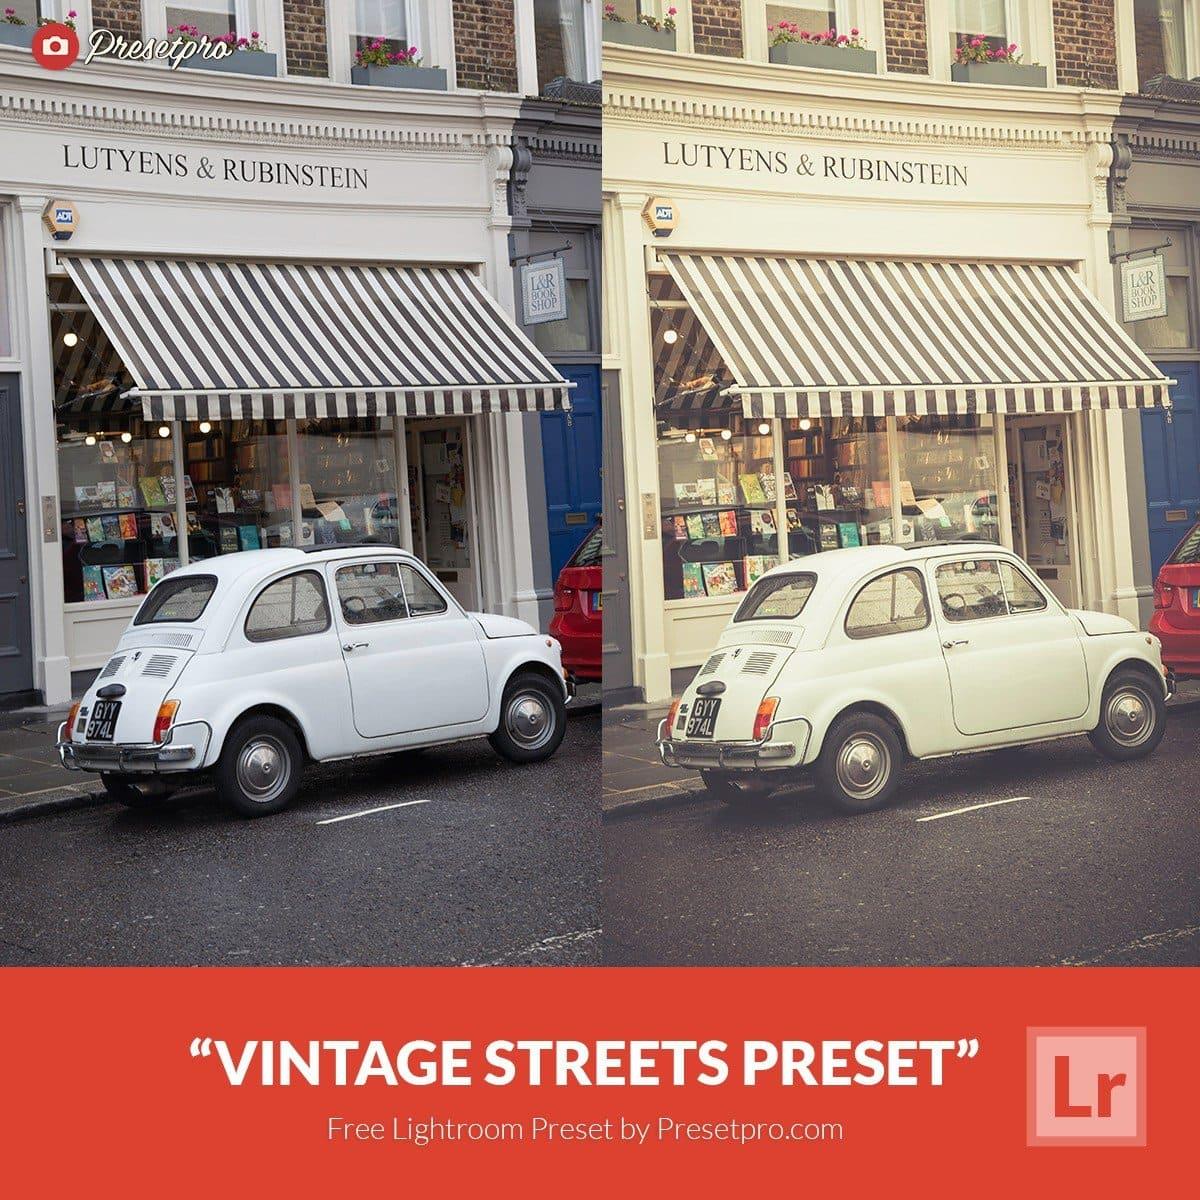 Free-Lightroom-Preset-Vintage-Streets-Presetpro.com